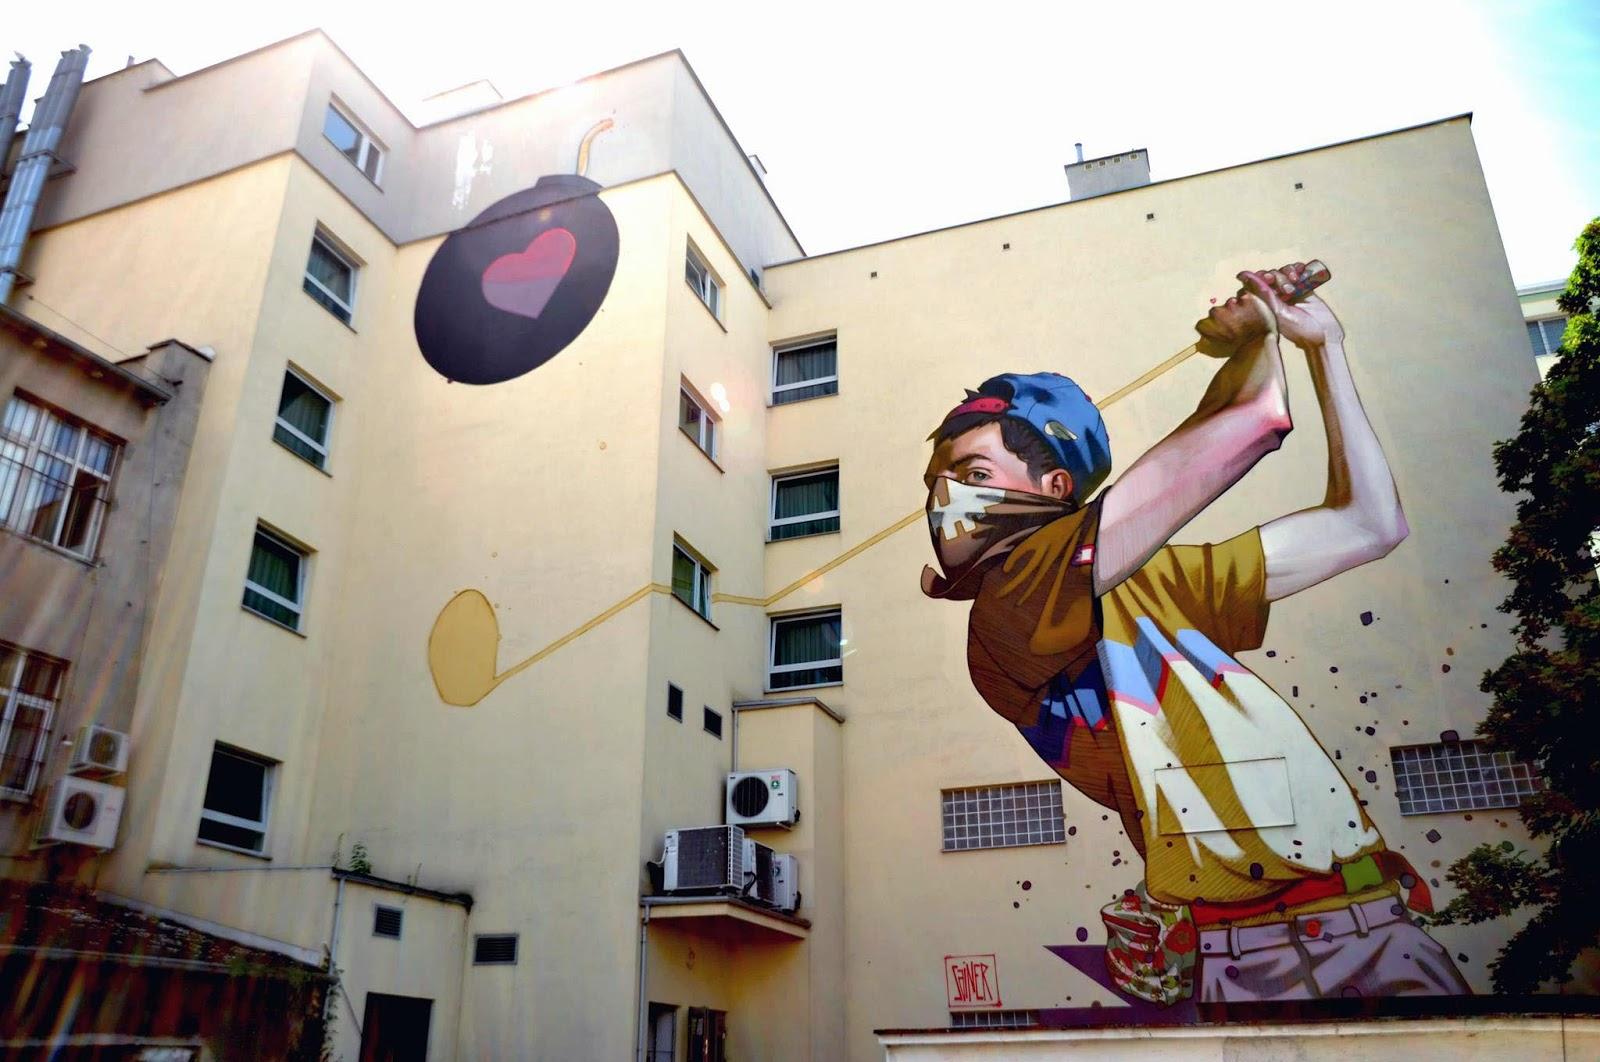 Sainer New Mural In Gdynia Poland Streetartnews